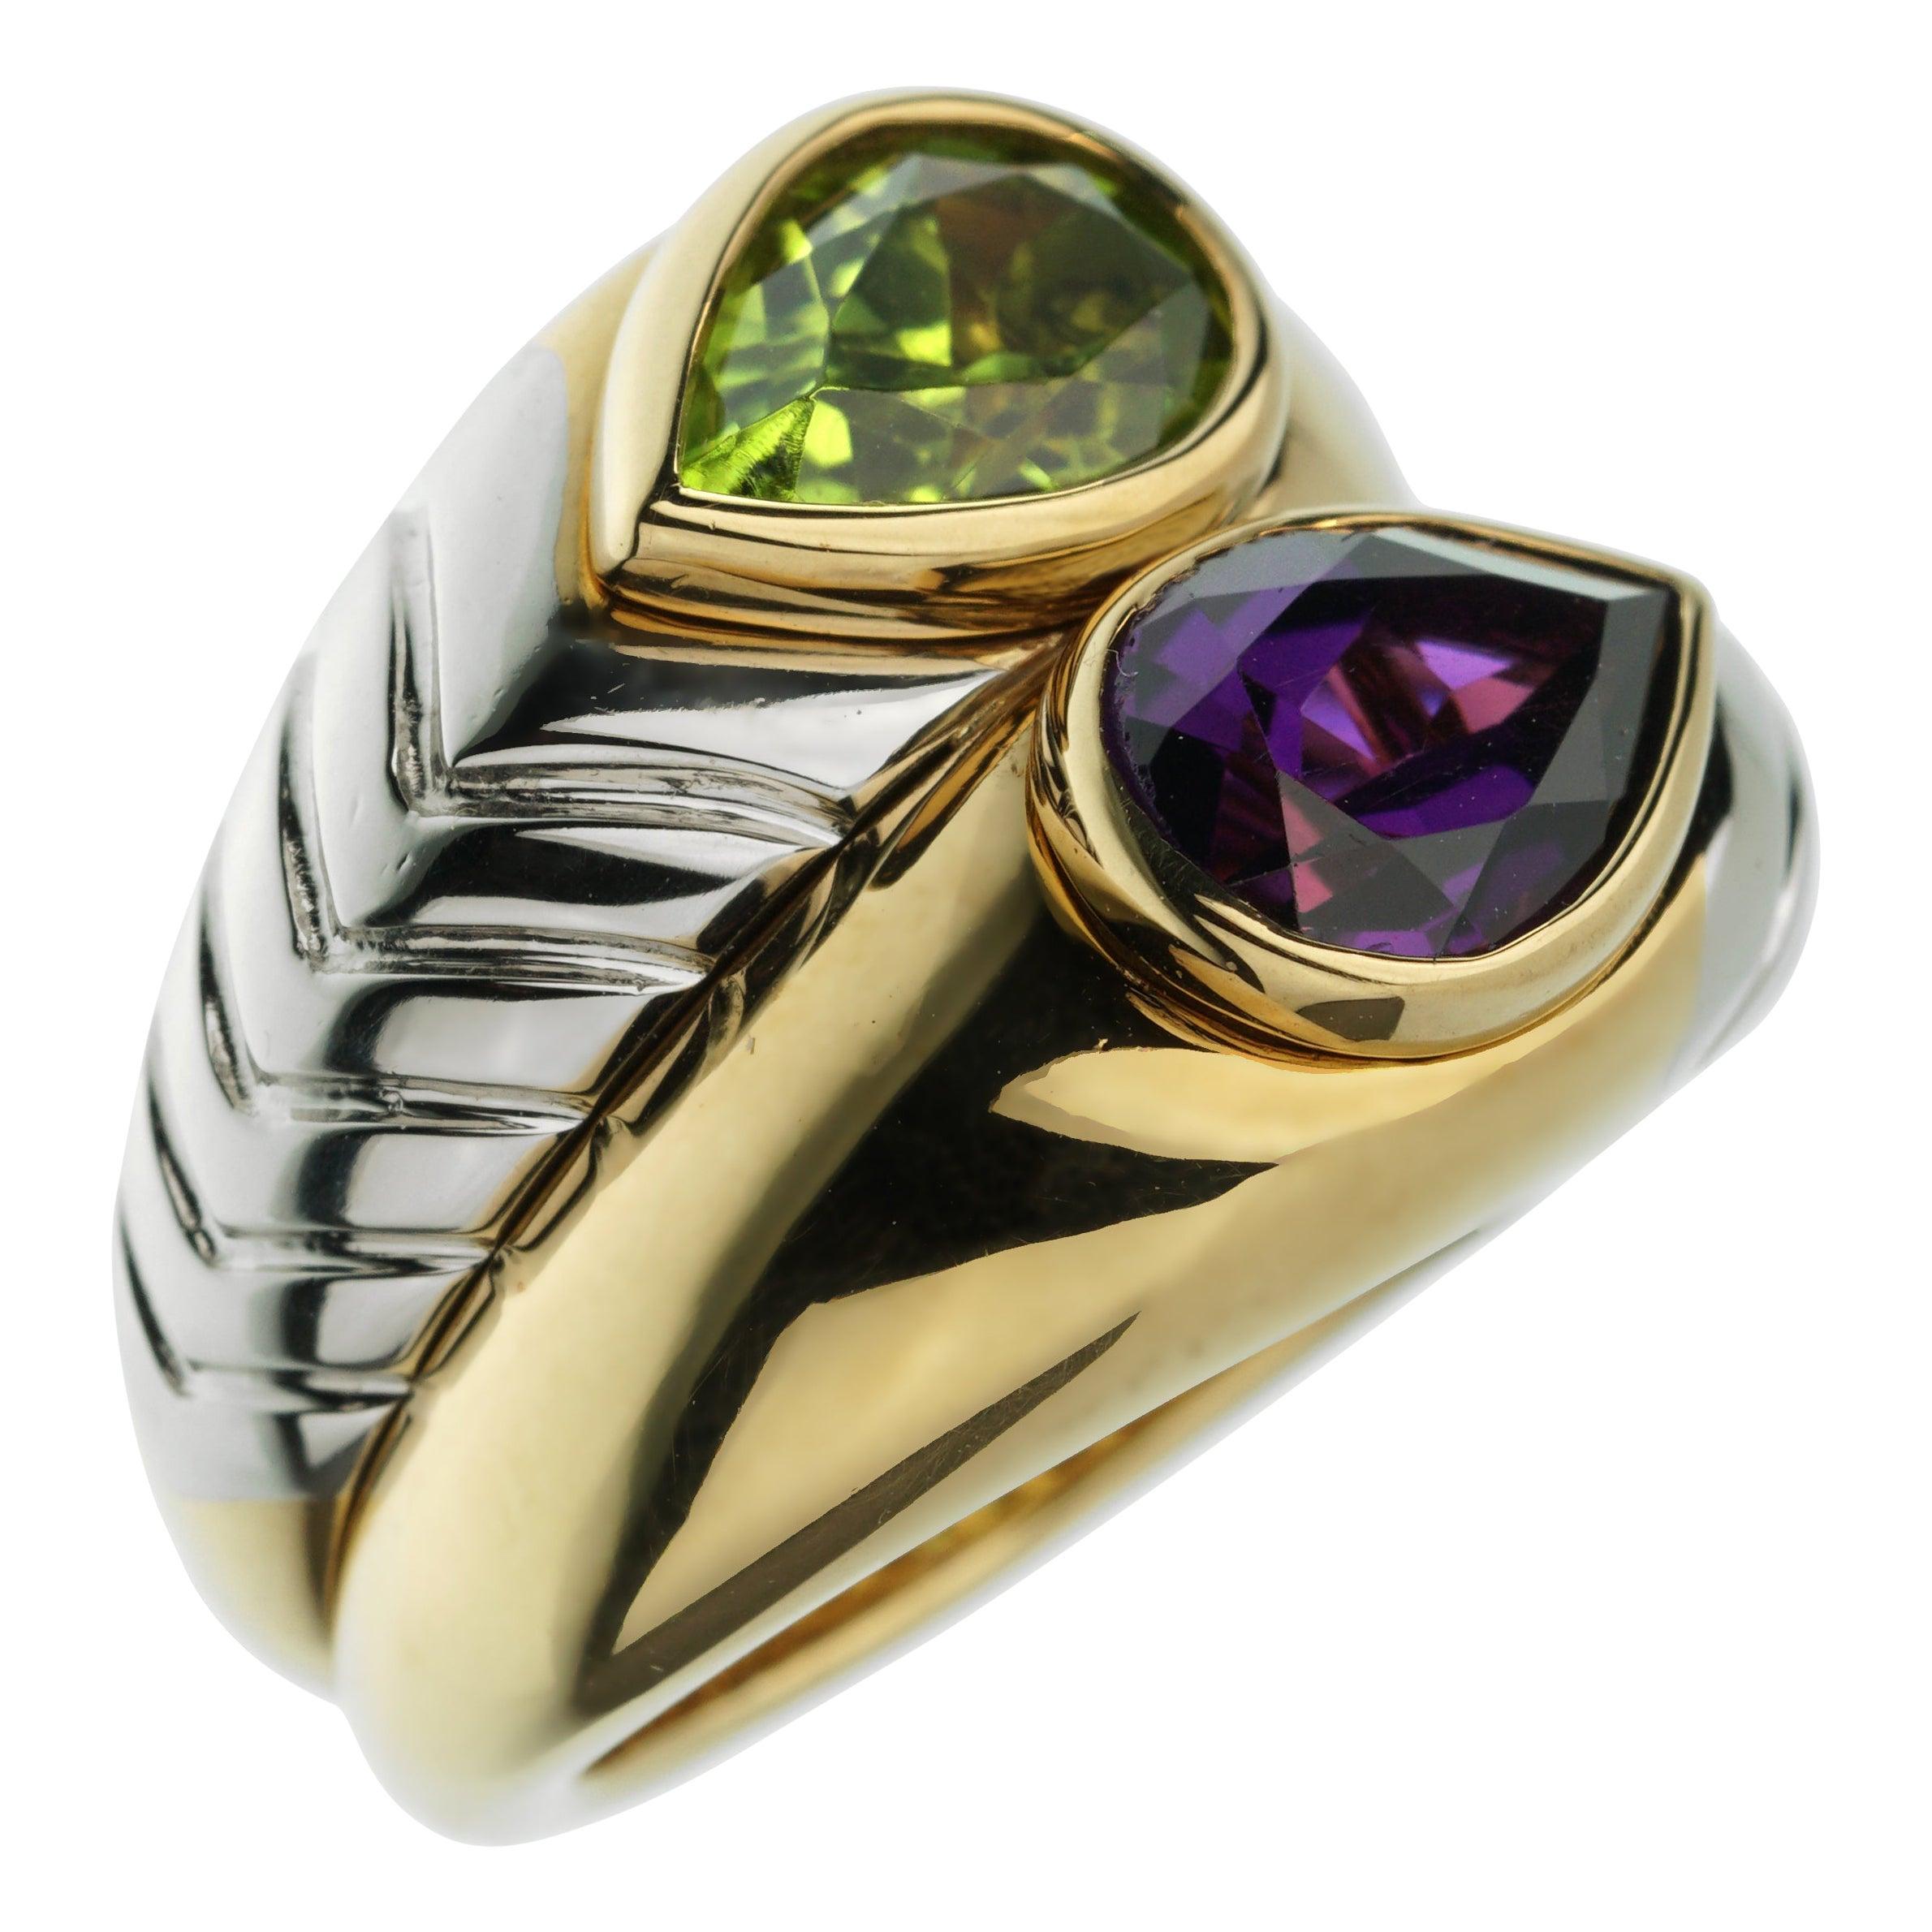 Bvlgari Amethyst Peridot Bypass Cocktail Gold Ring